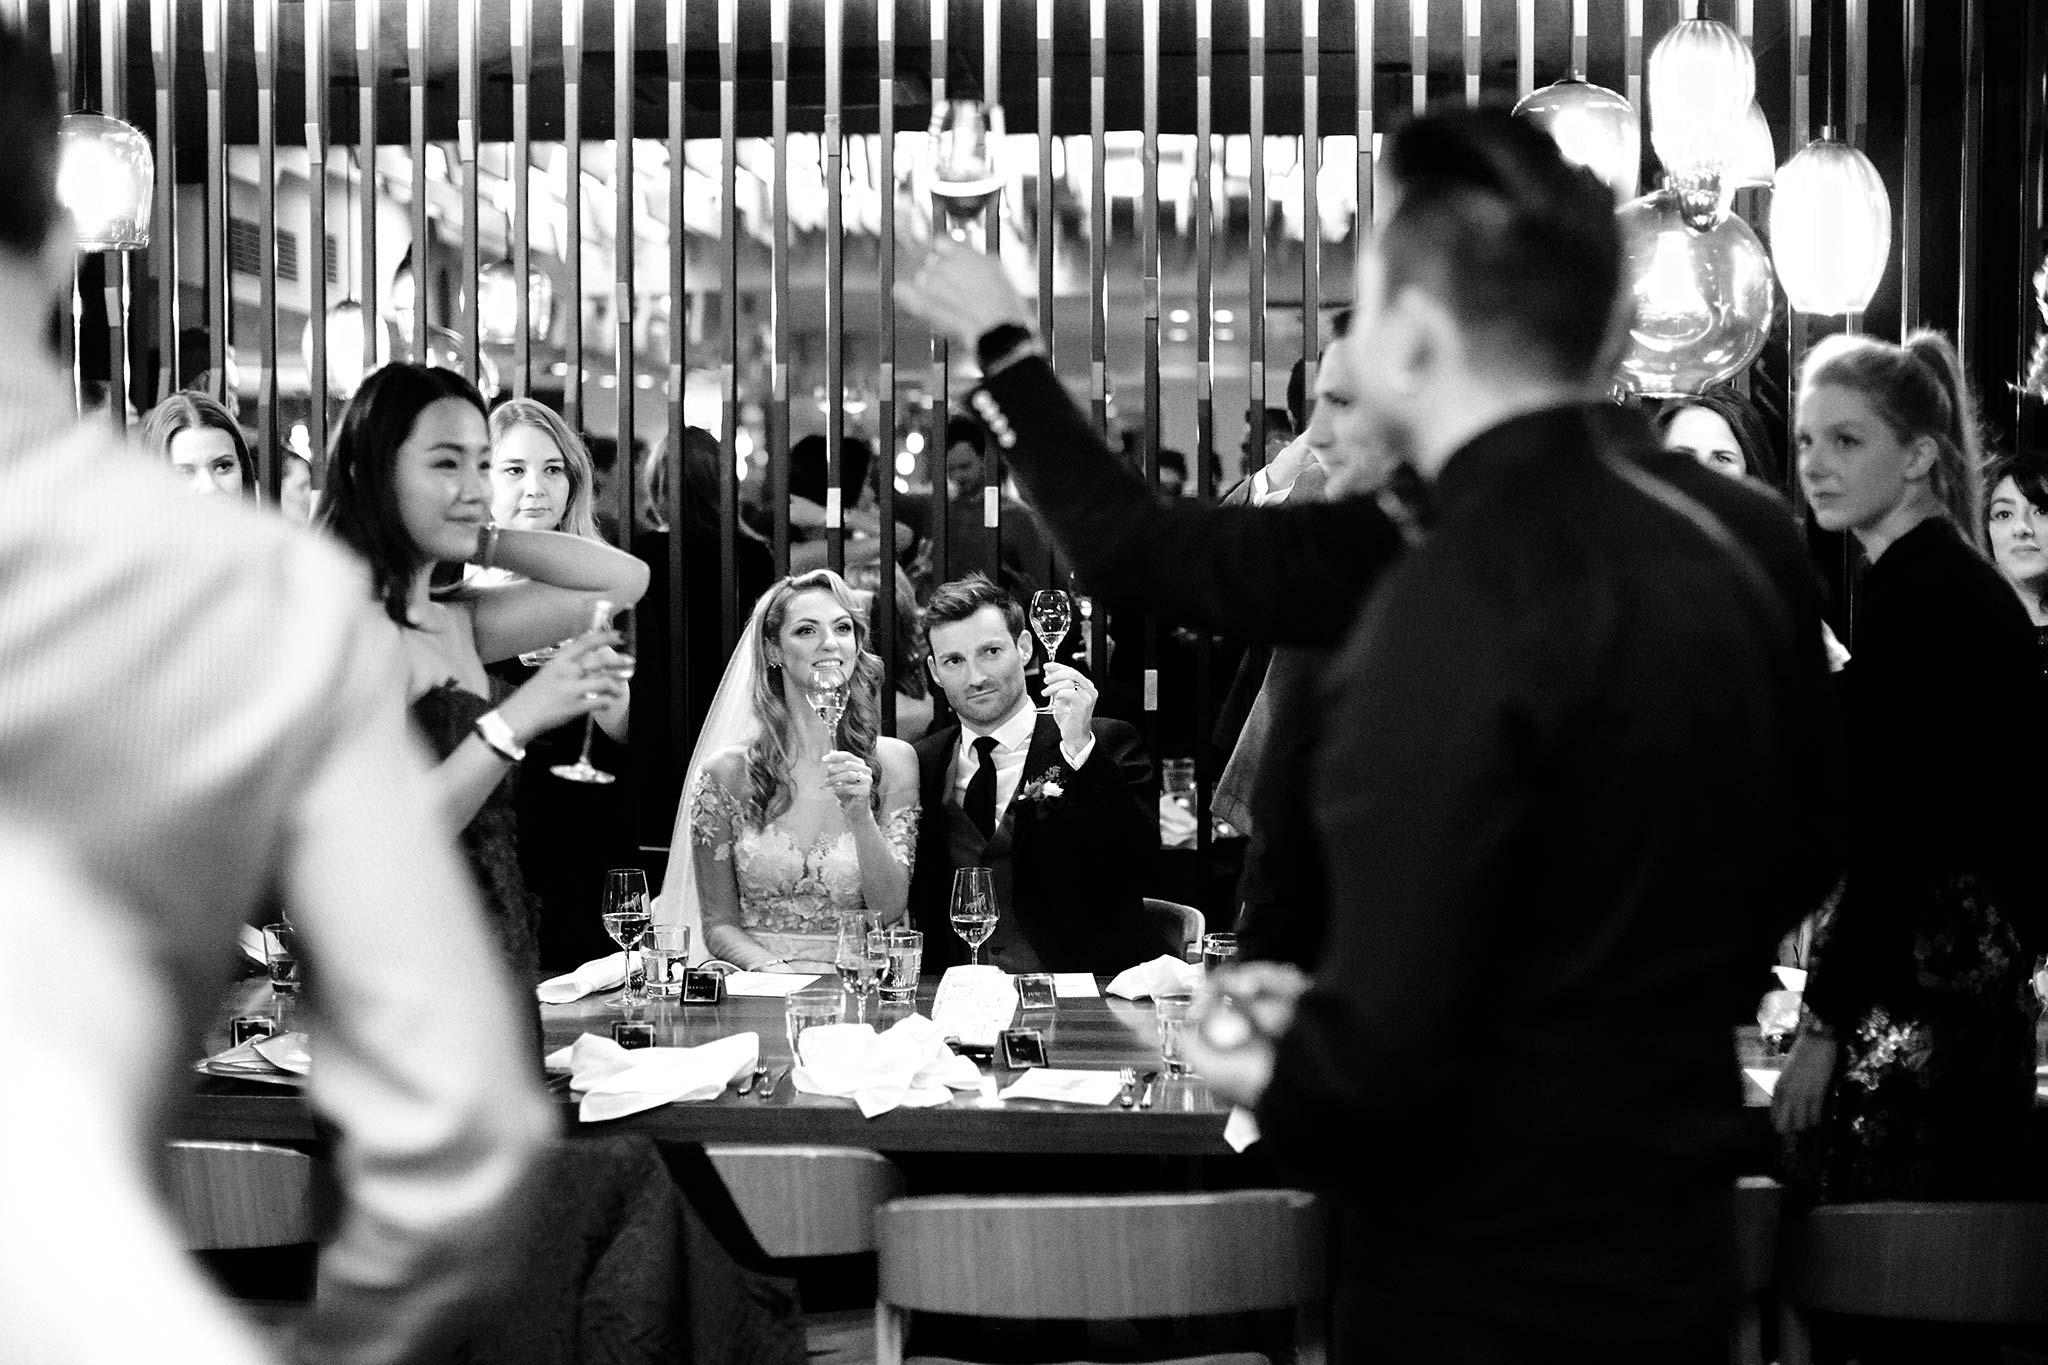 Melbourne-tour-bus-wedding-bride-maha-reception-speech-toast